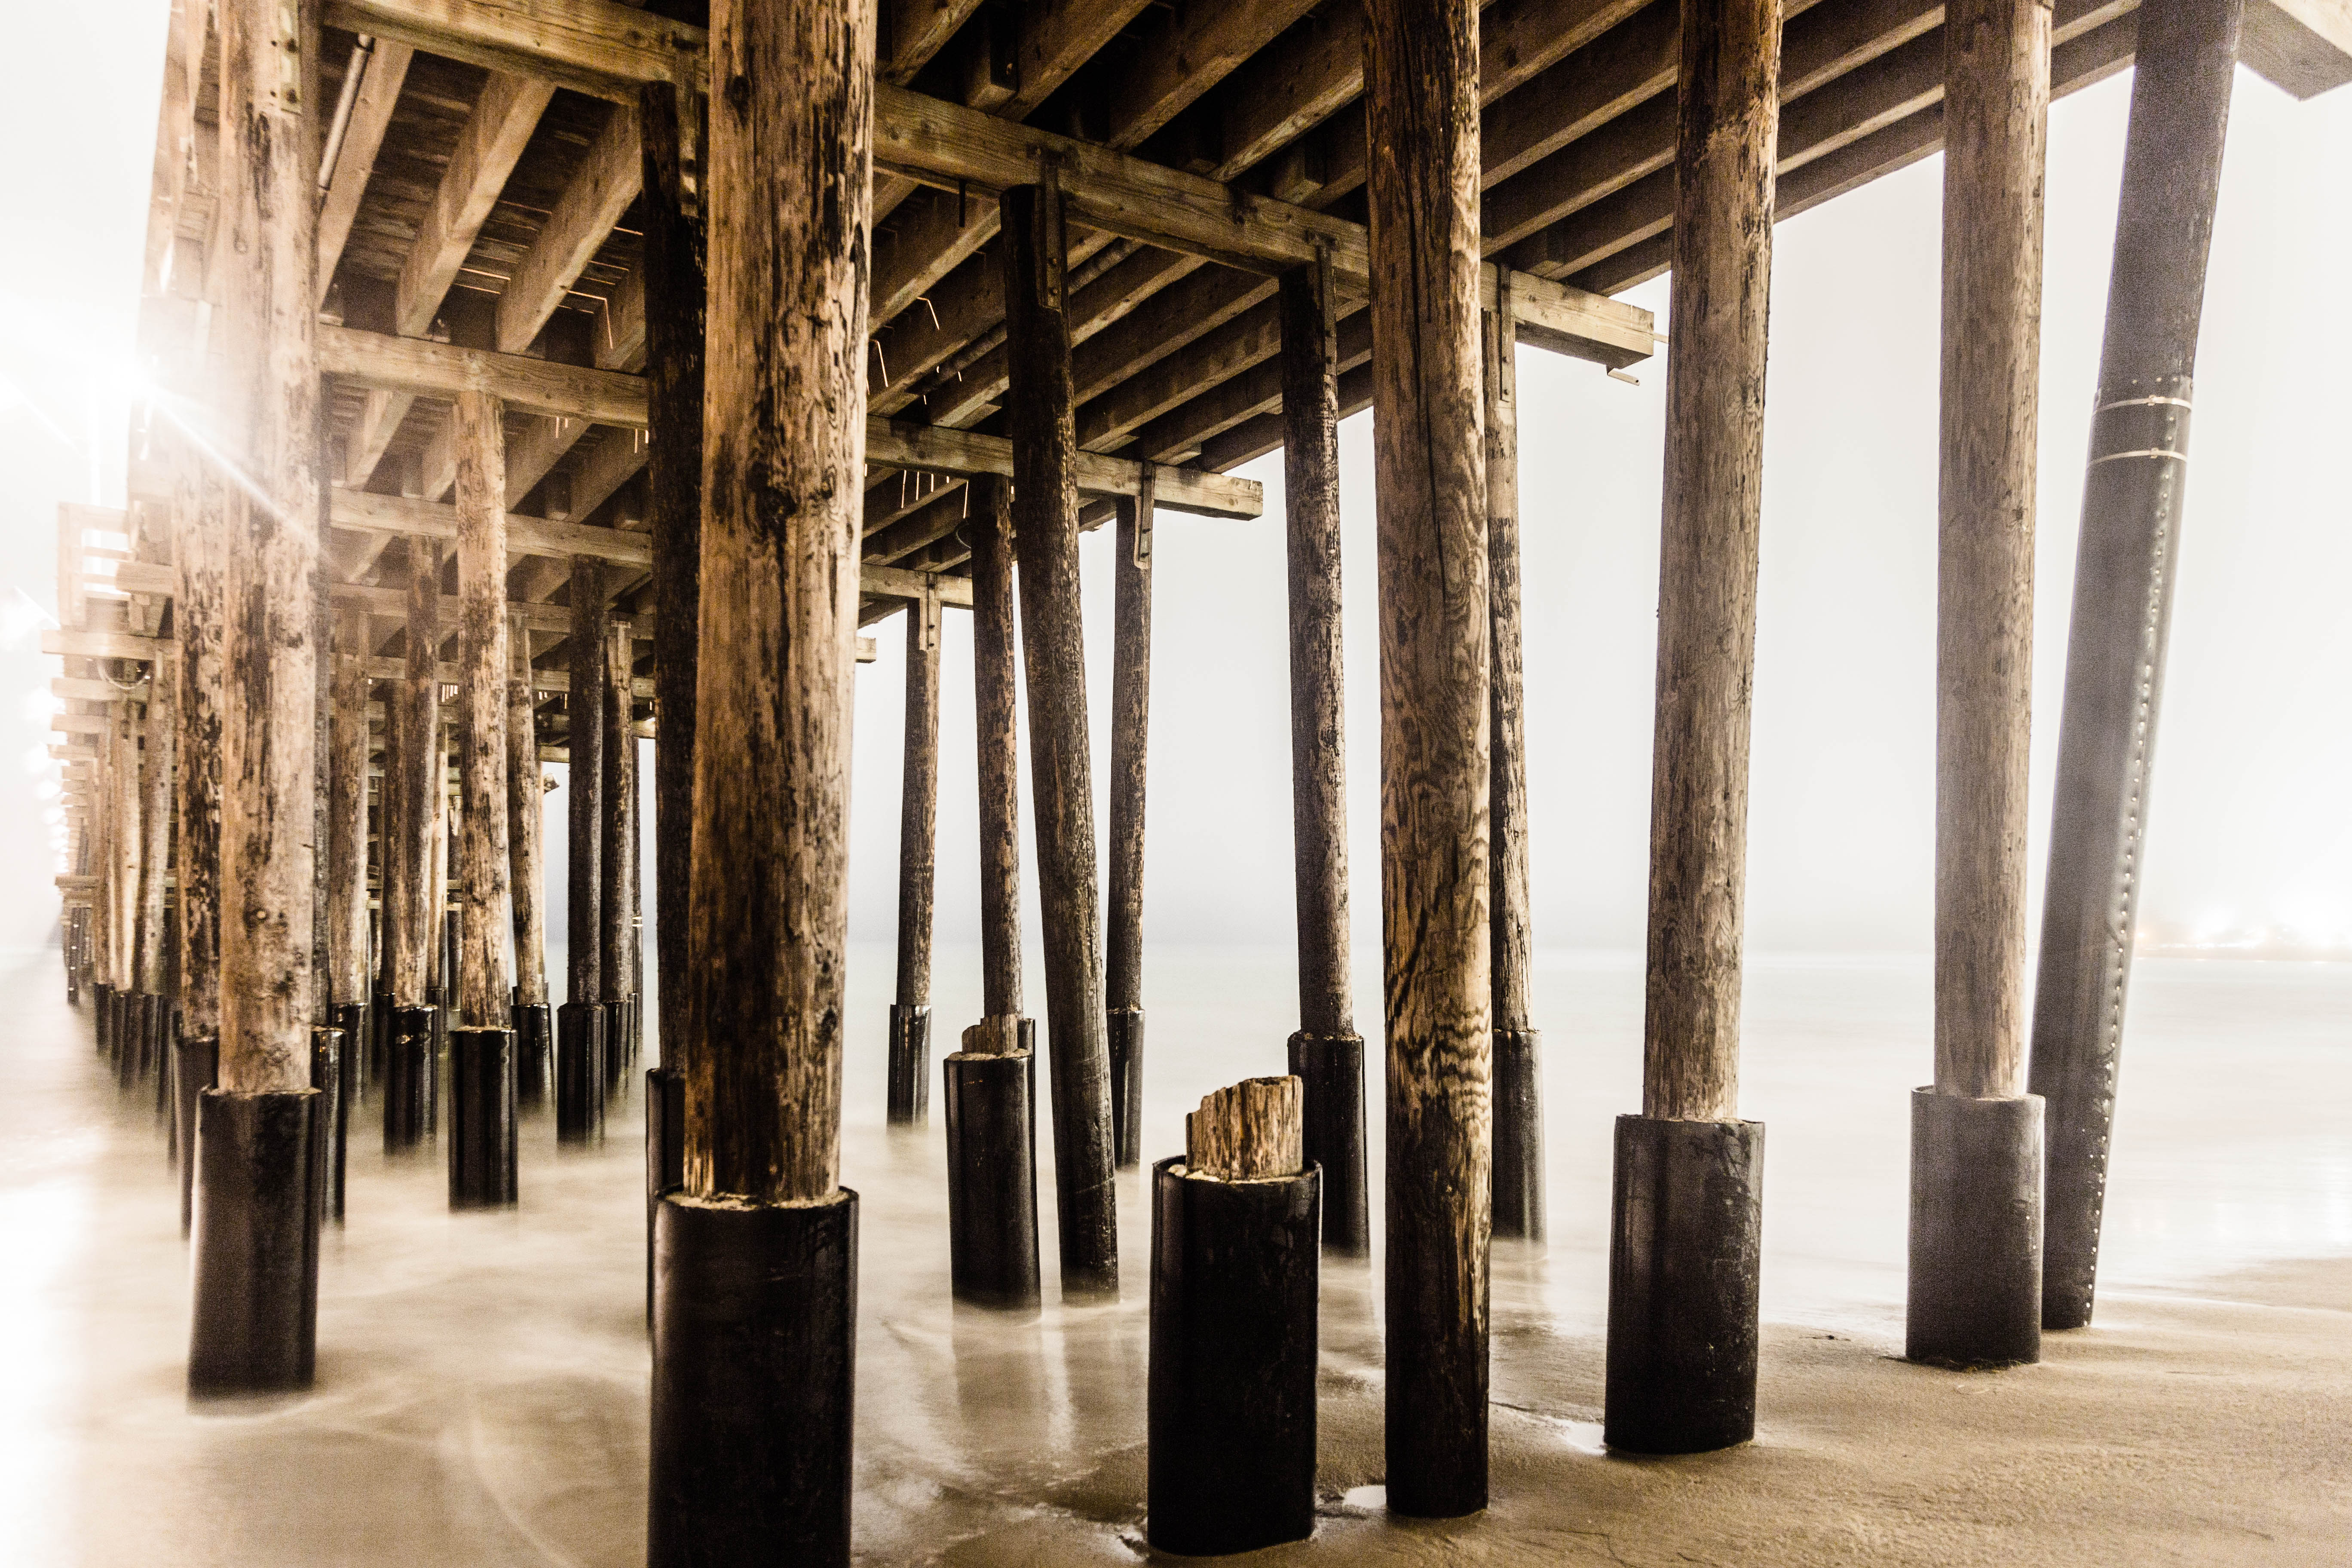 Under Ventura Pier